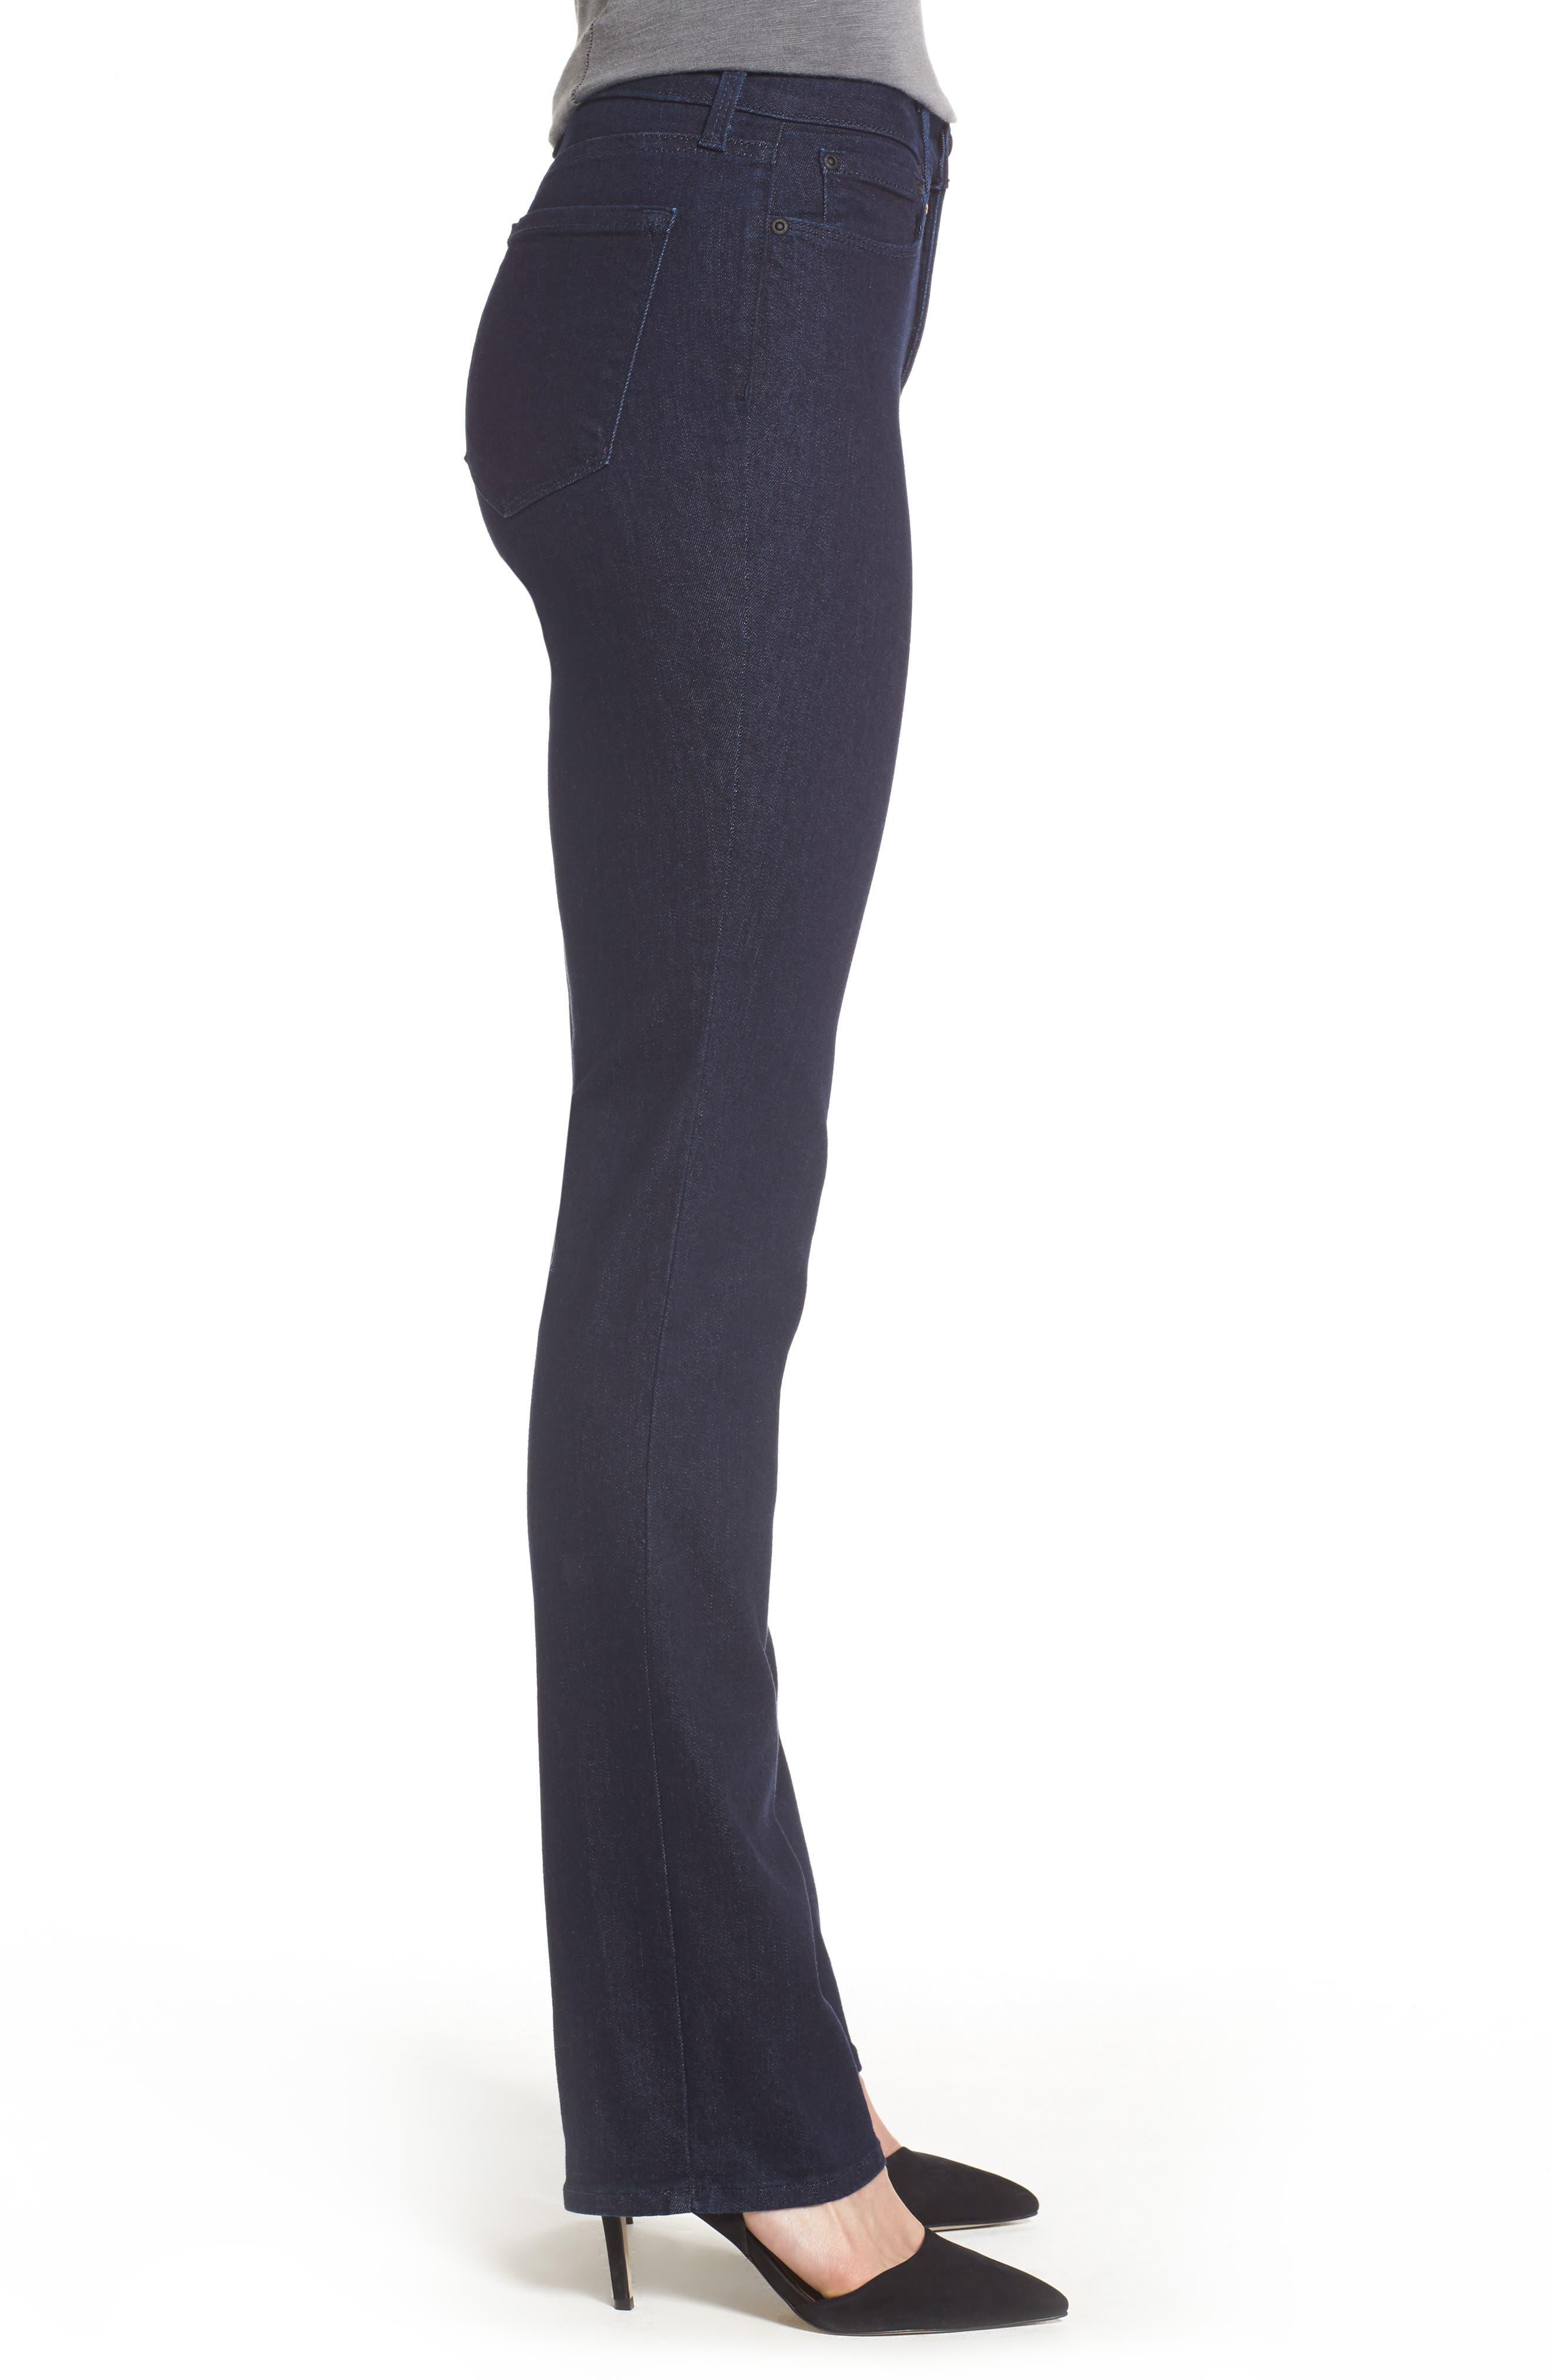 Alternate Image 3  - NYDJ Marilyn Stretch Straight Leg Jeans (Rinse) (Regular & Petite)